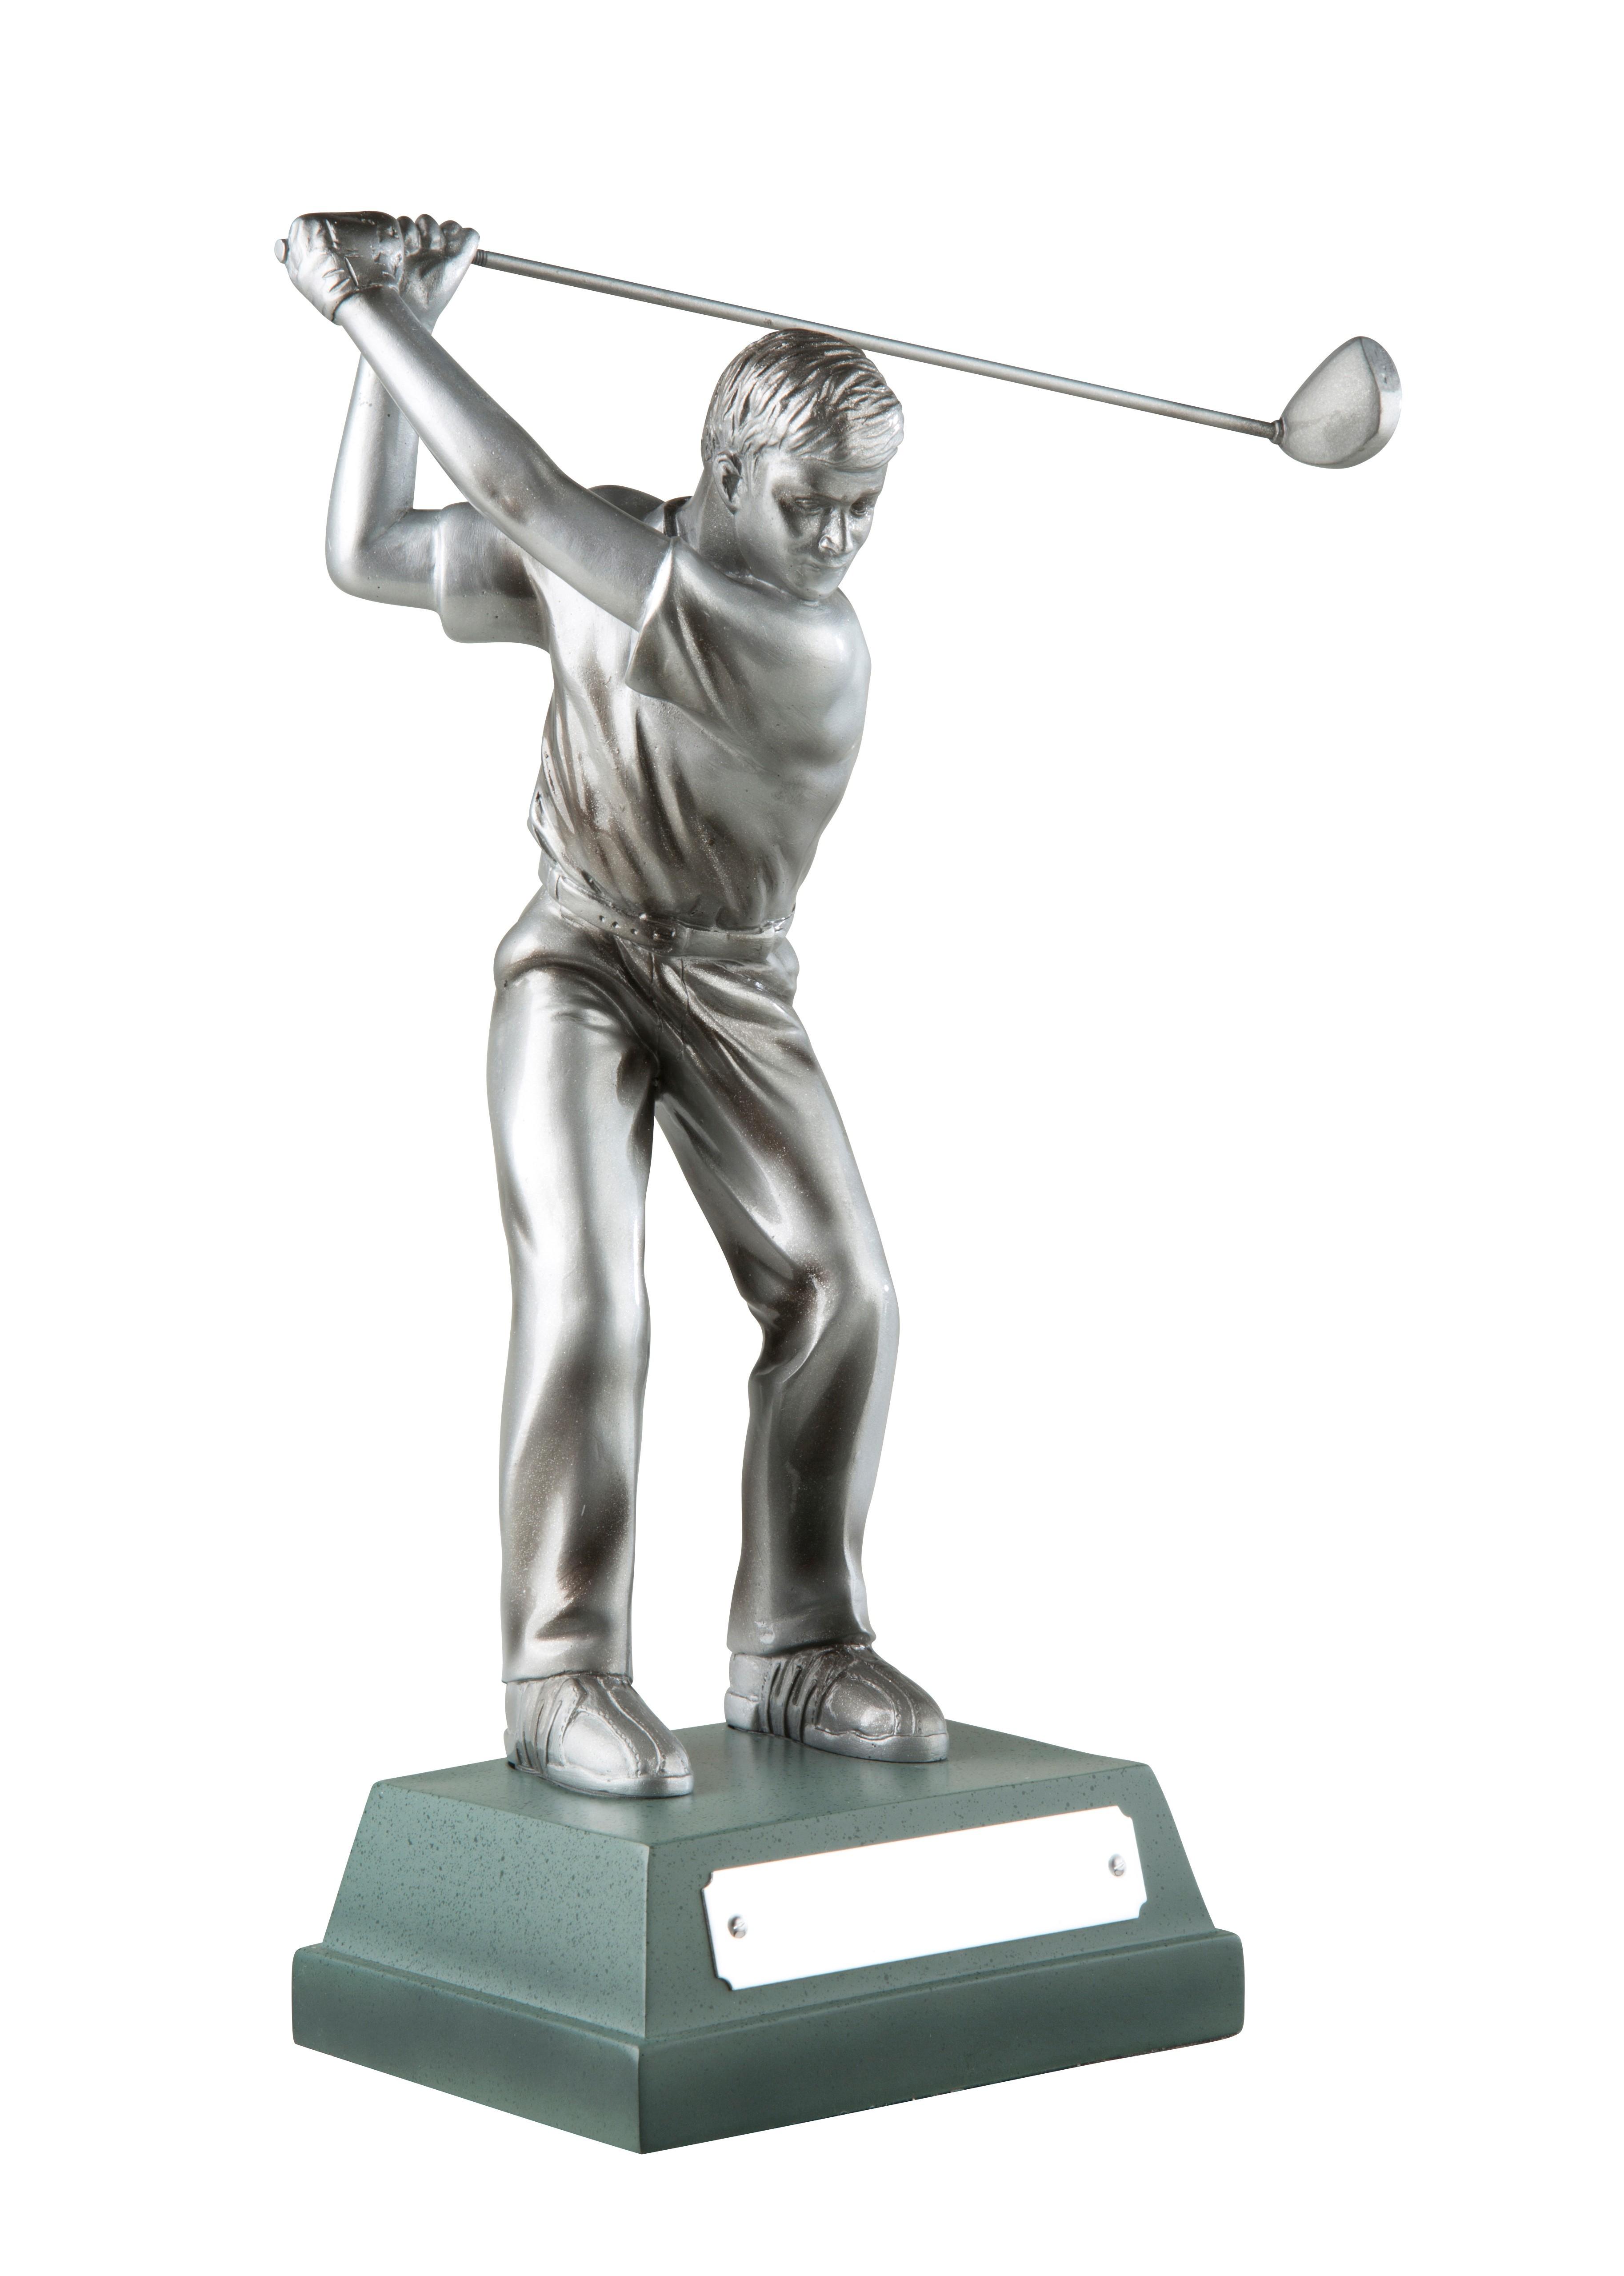 15cm Sil Finish Male Golfer